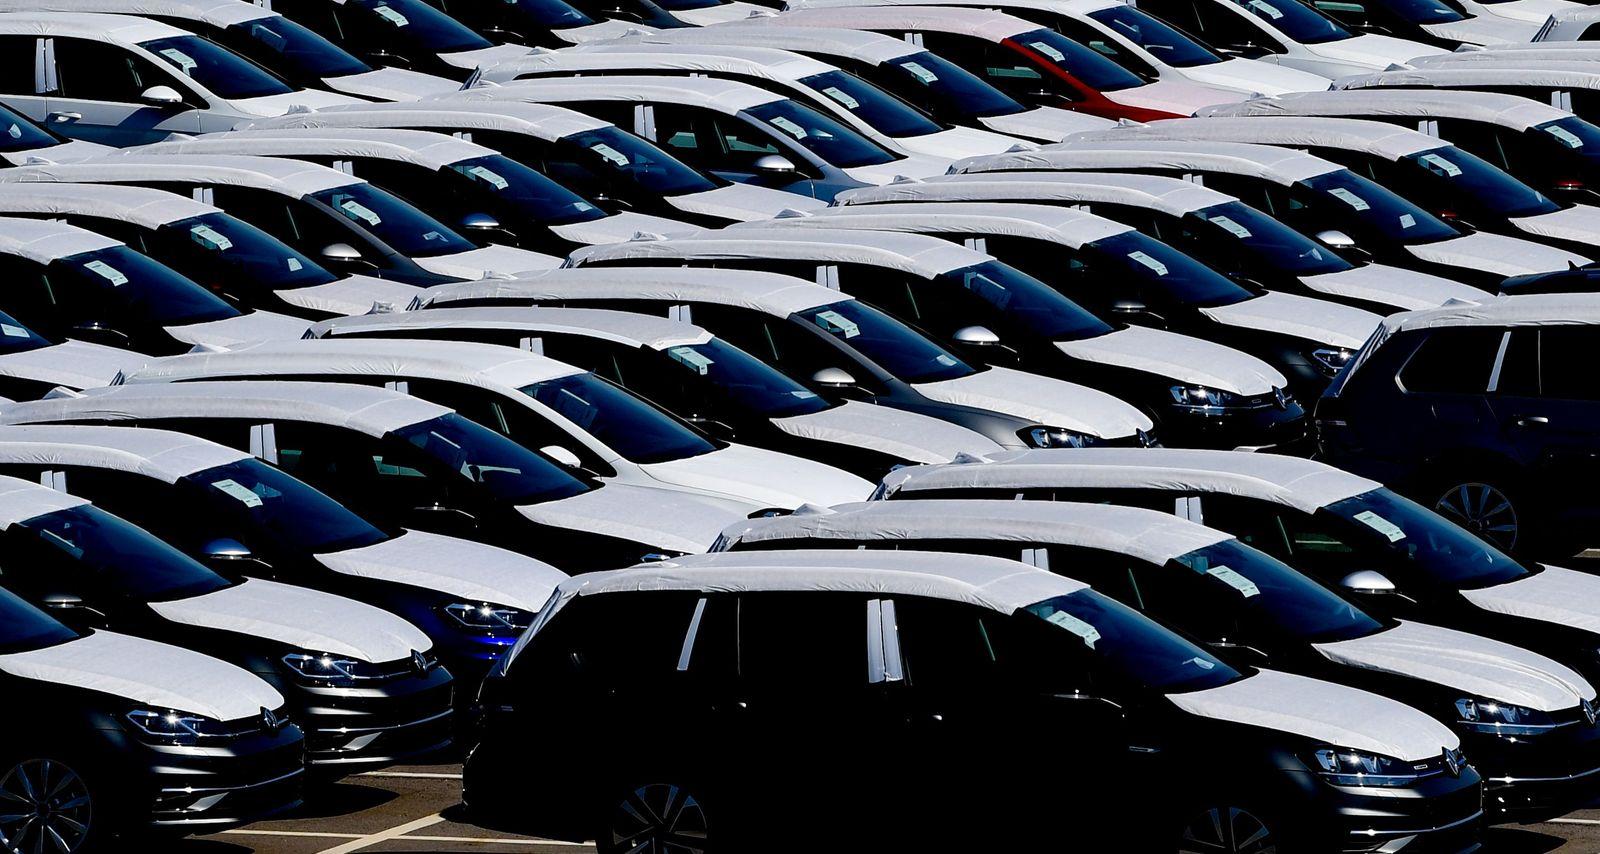 Volkswagen suspends production, Zwickau, Germany - 02 Apr 2020